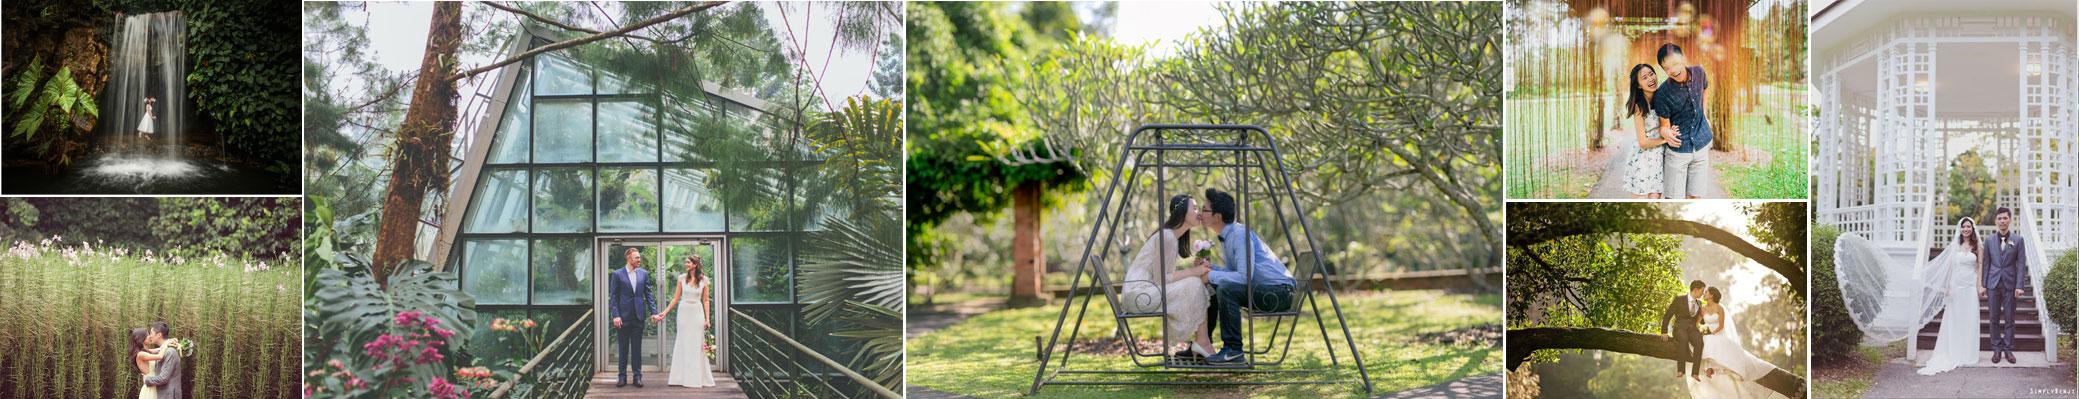 singapore-botanic-garden-wedding